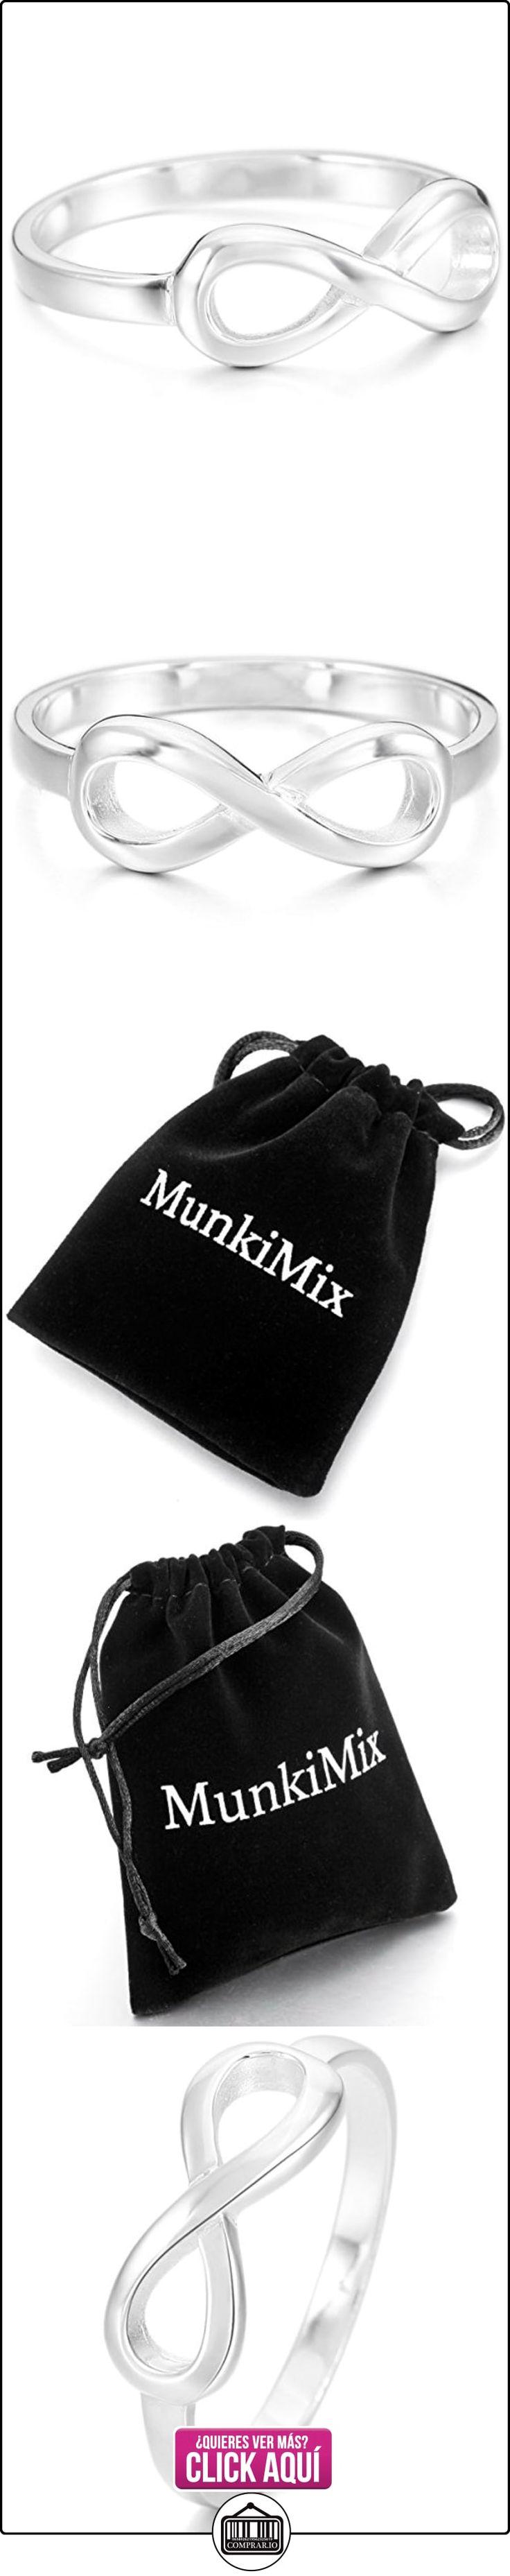 MunkiMix 925 Plata Anillo Ring Plata Infinito Infinity Símbolo 8 Anillo Ring Talla Tamaño 9 Mujer  ✿ Joyas para mujer - Las mejores ofertas ✿ ▬► Ver oferta: https://comprar.io/goto/B00N72ZJMW